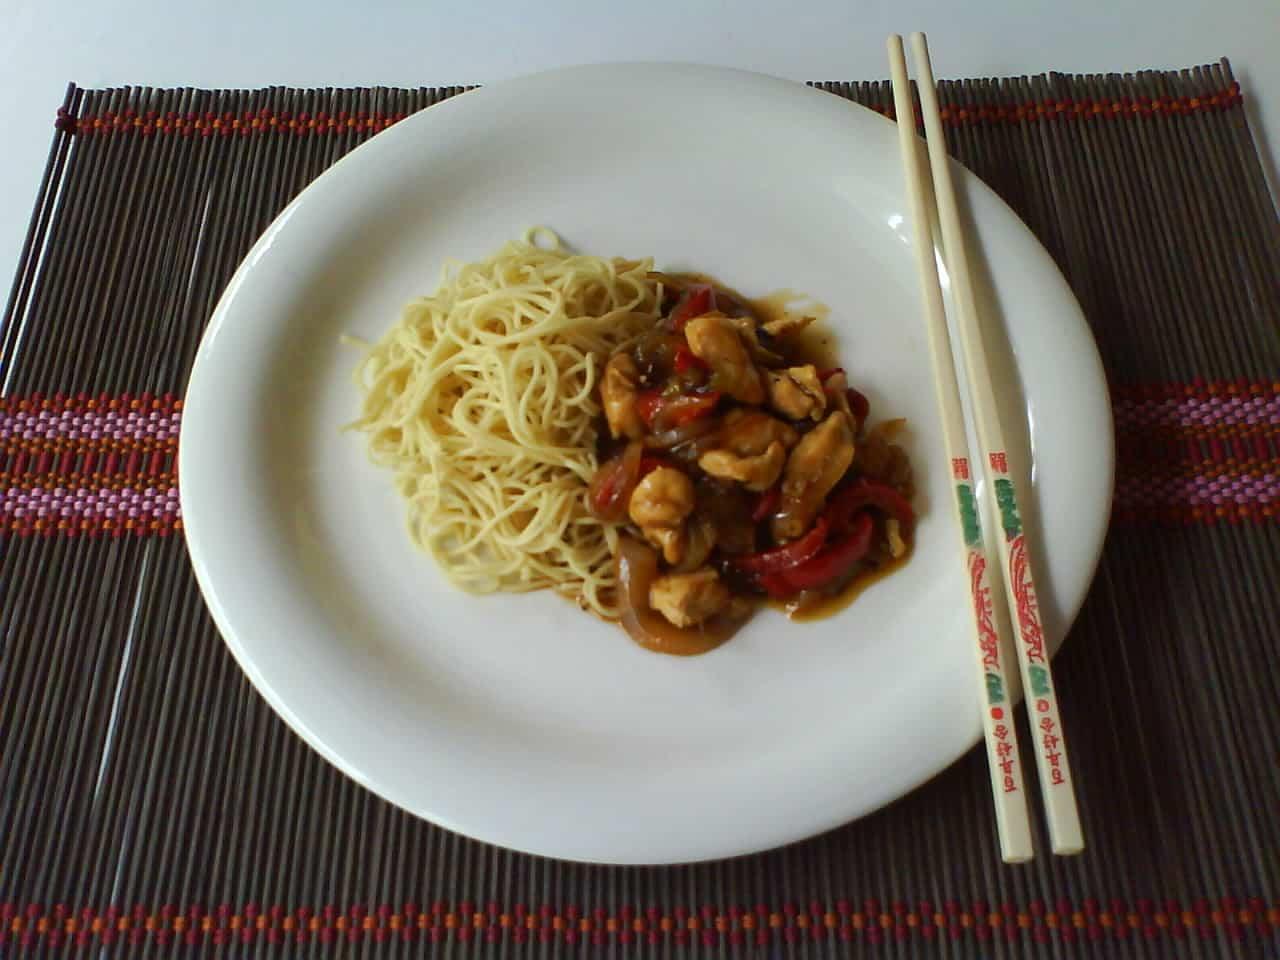 Genial cocinar en wok fotos 5 tips para cocinar en wok for Resetas para cocinar